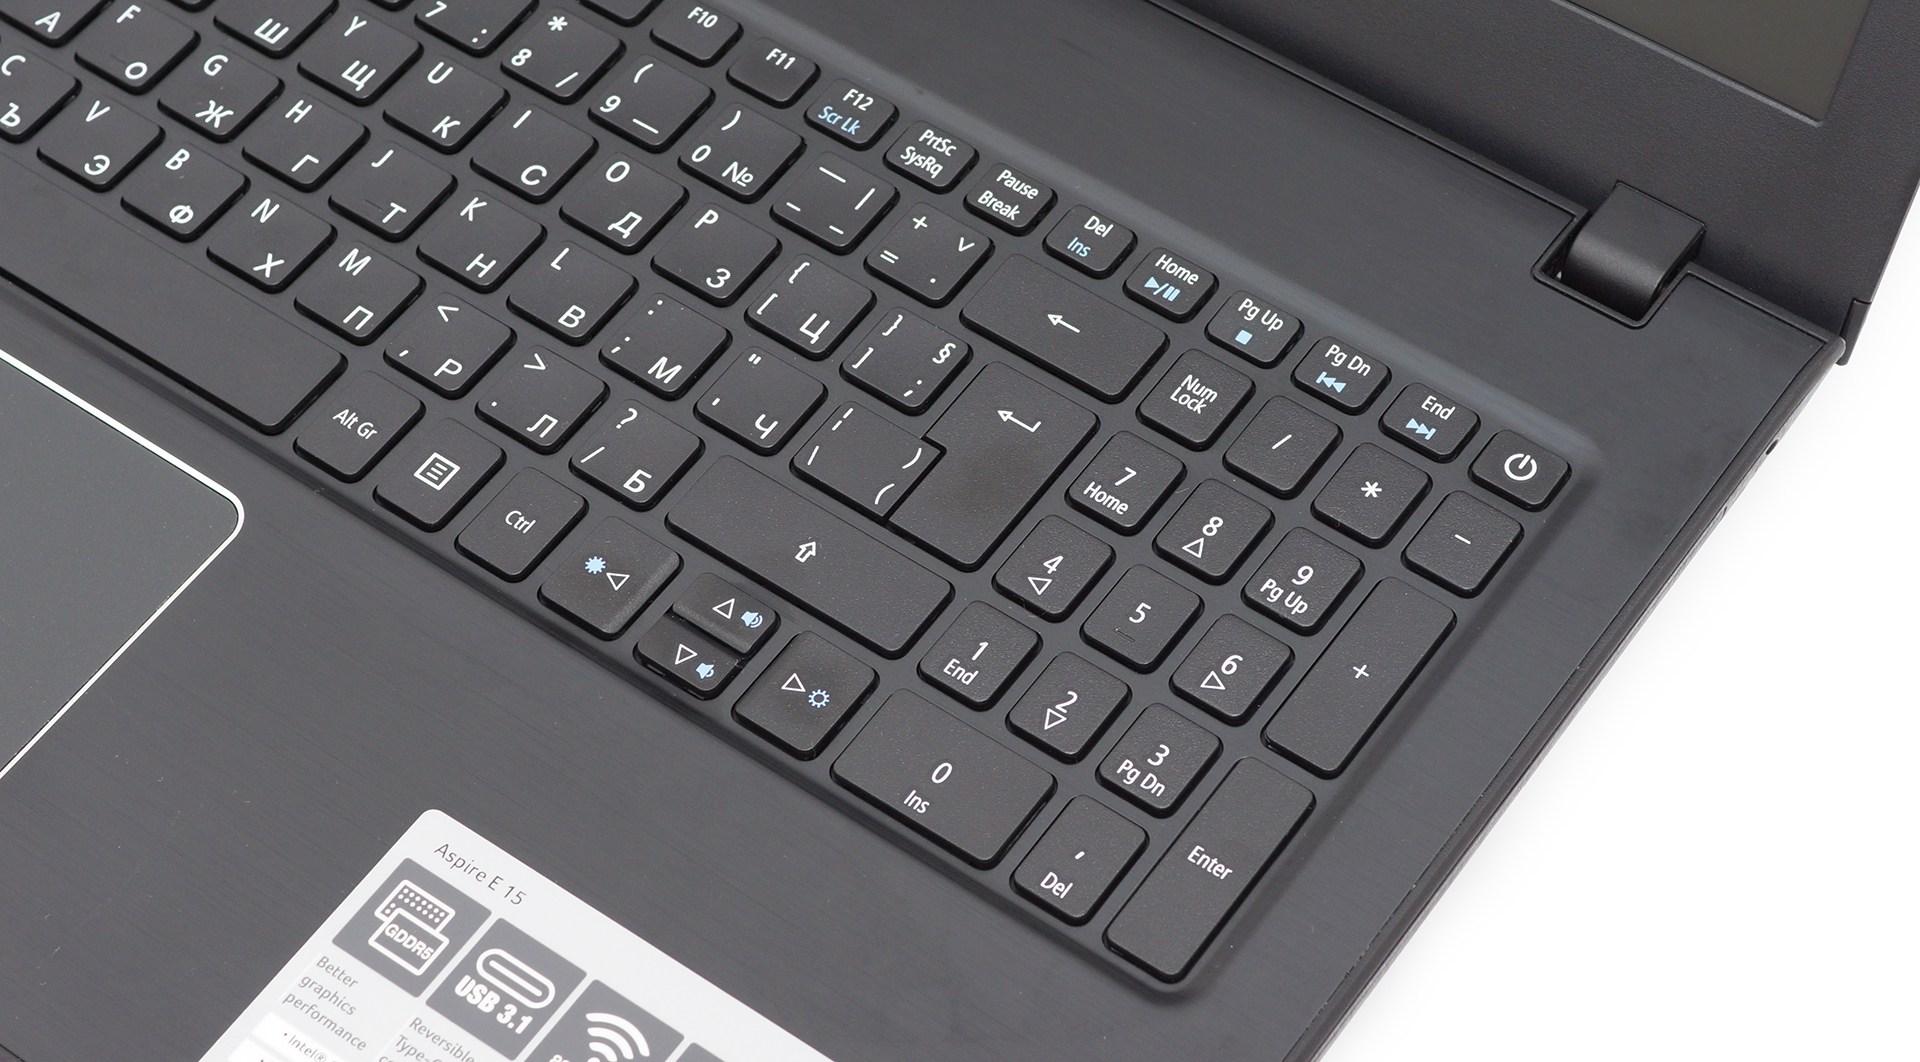 ТОП ноутбуков до 15000 гривен 8